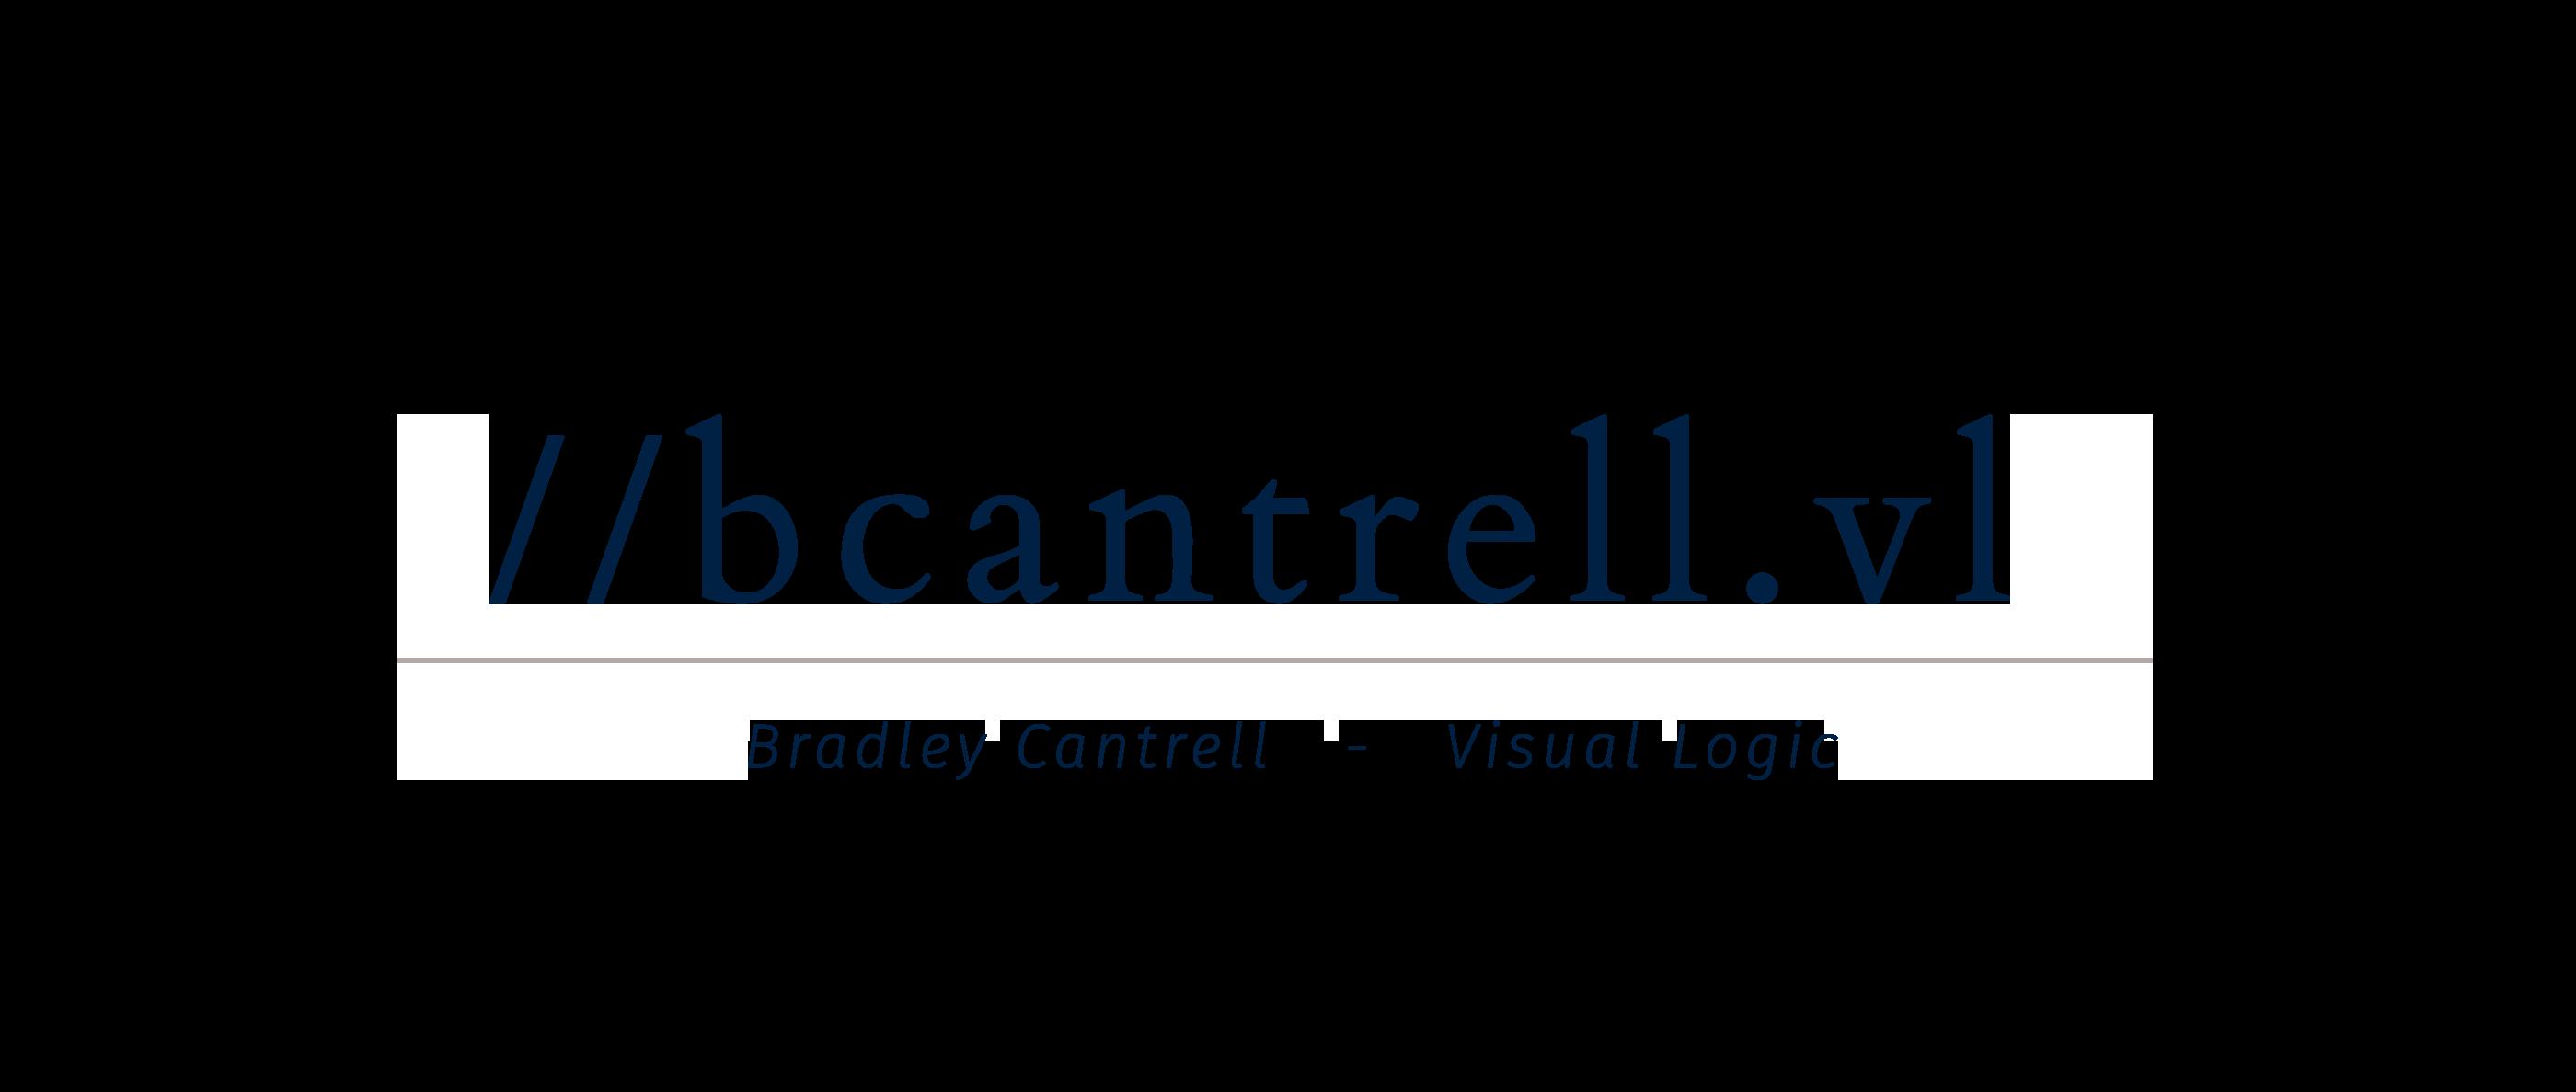 //bcantrell . vl